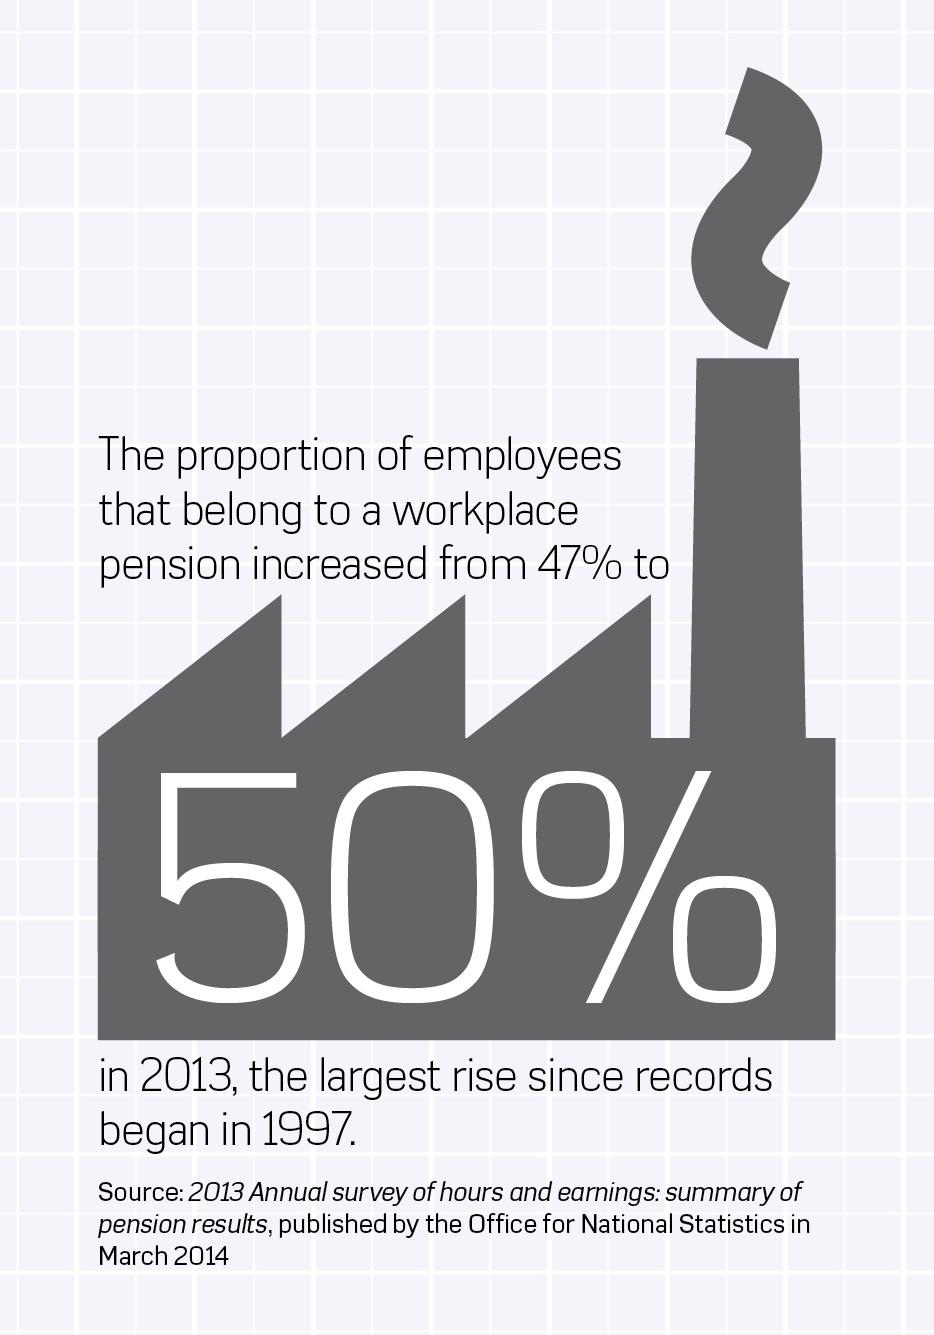 EmployeeBenefits-PensionsInNumbers-May2014